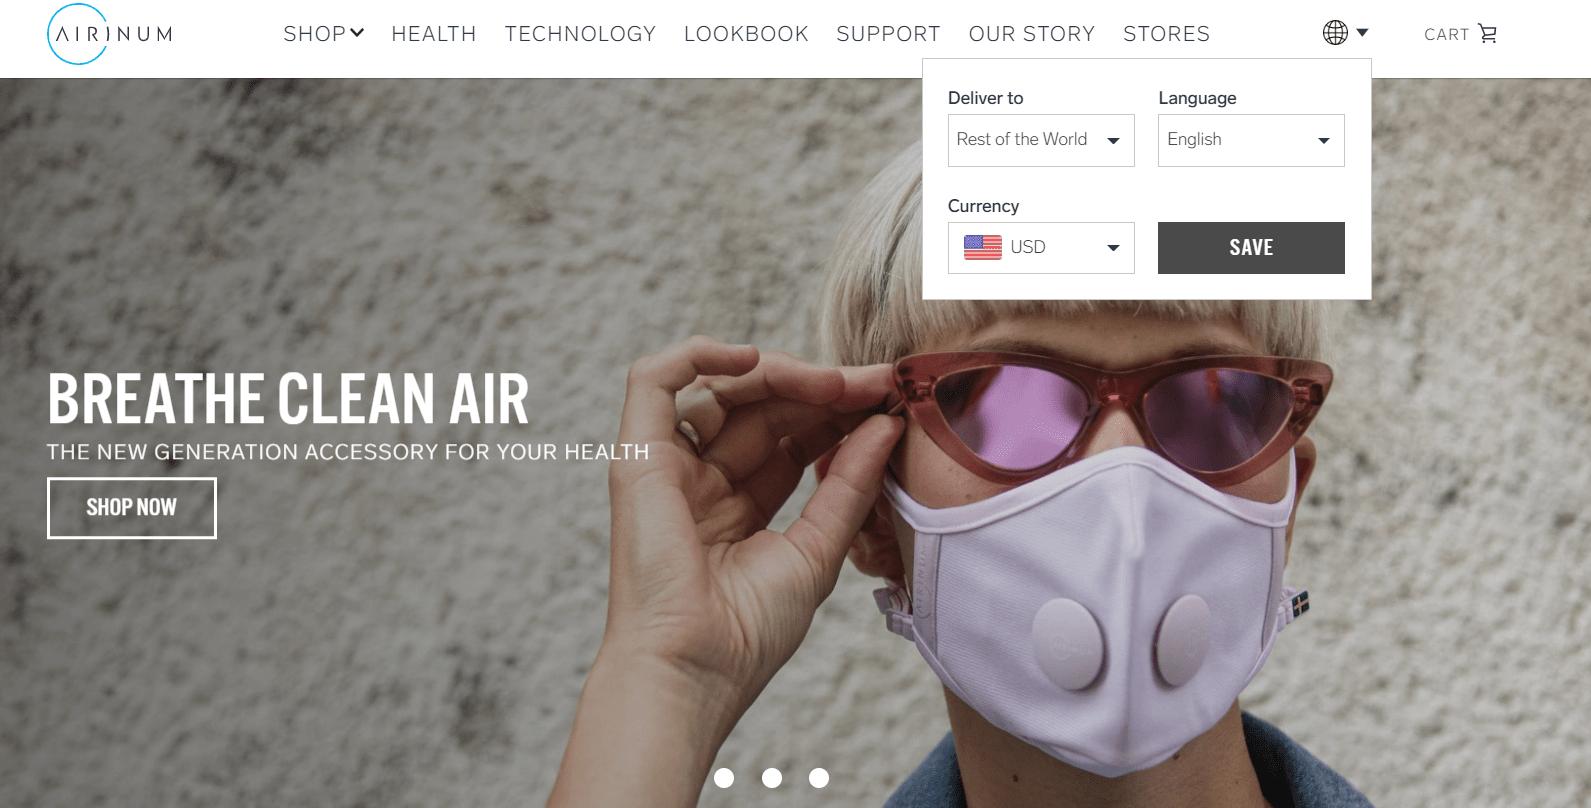 airnium easyship client example